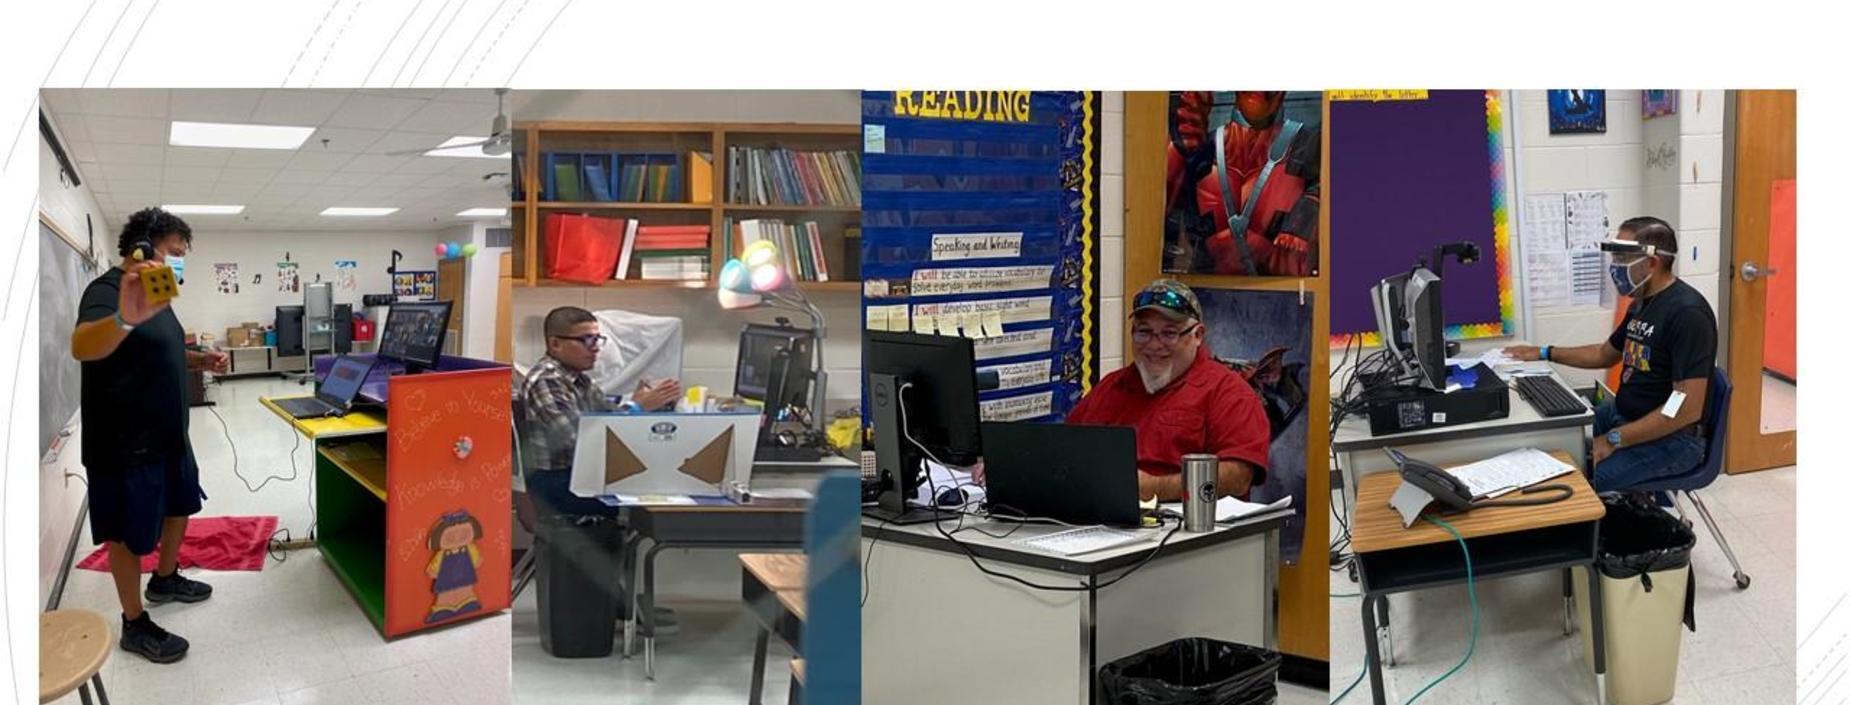 Teachers busy teaching virtually